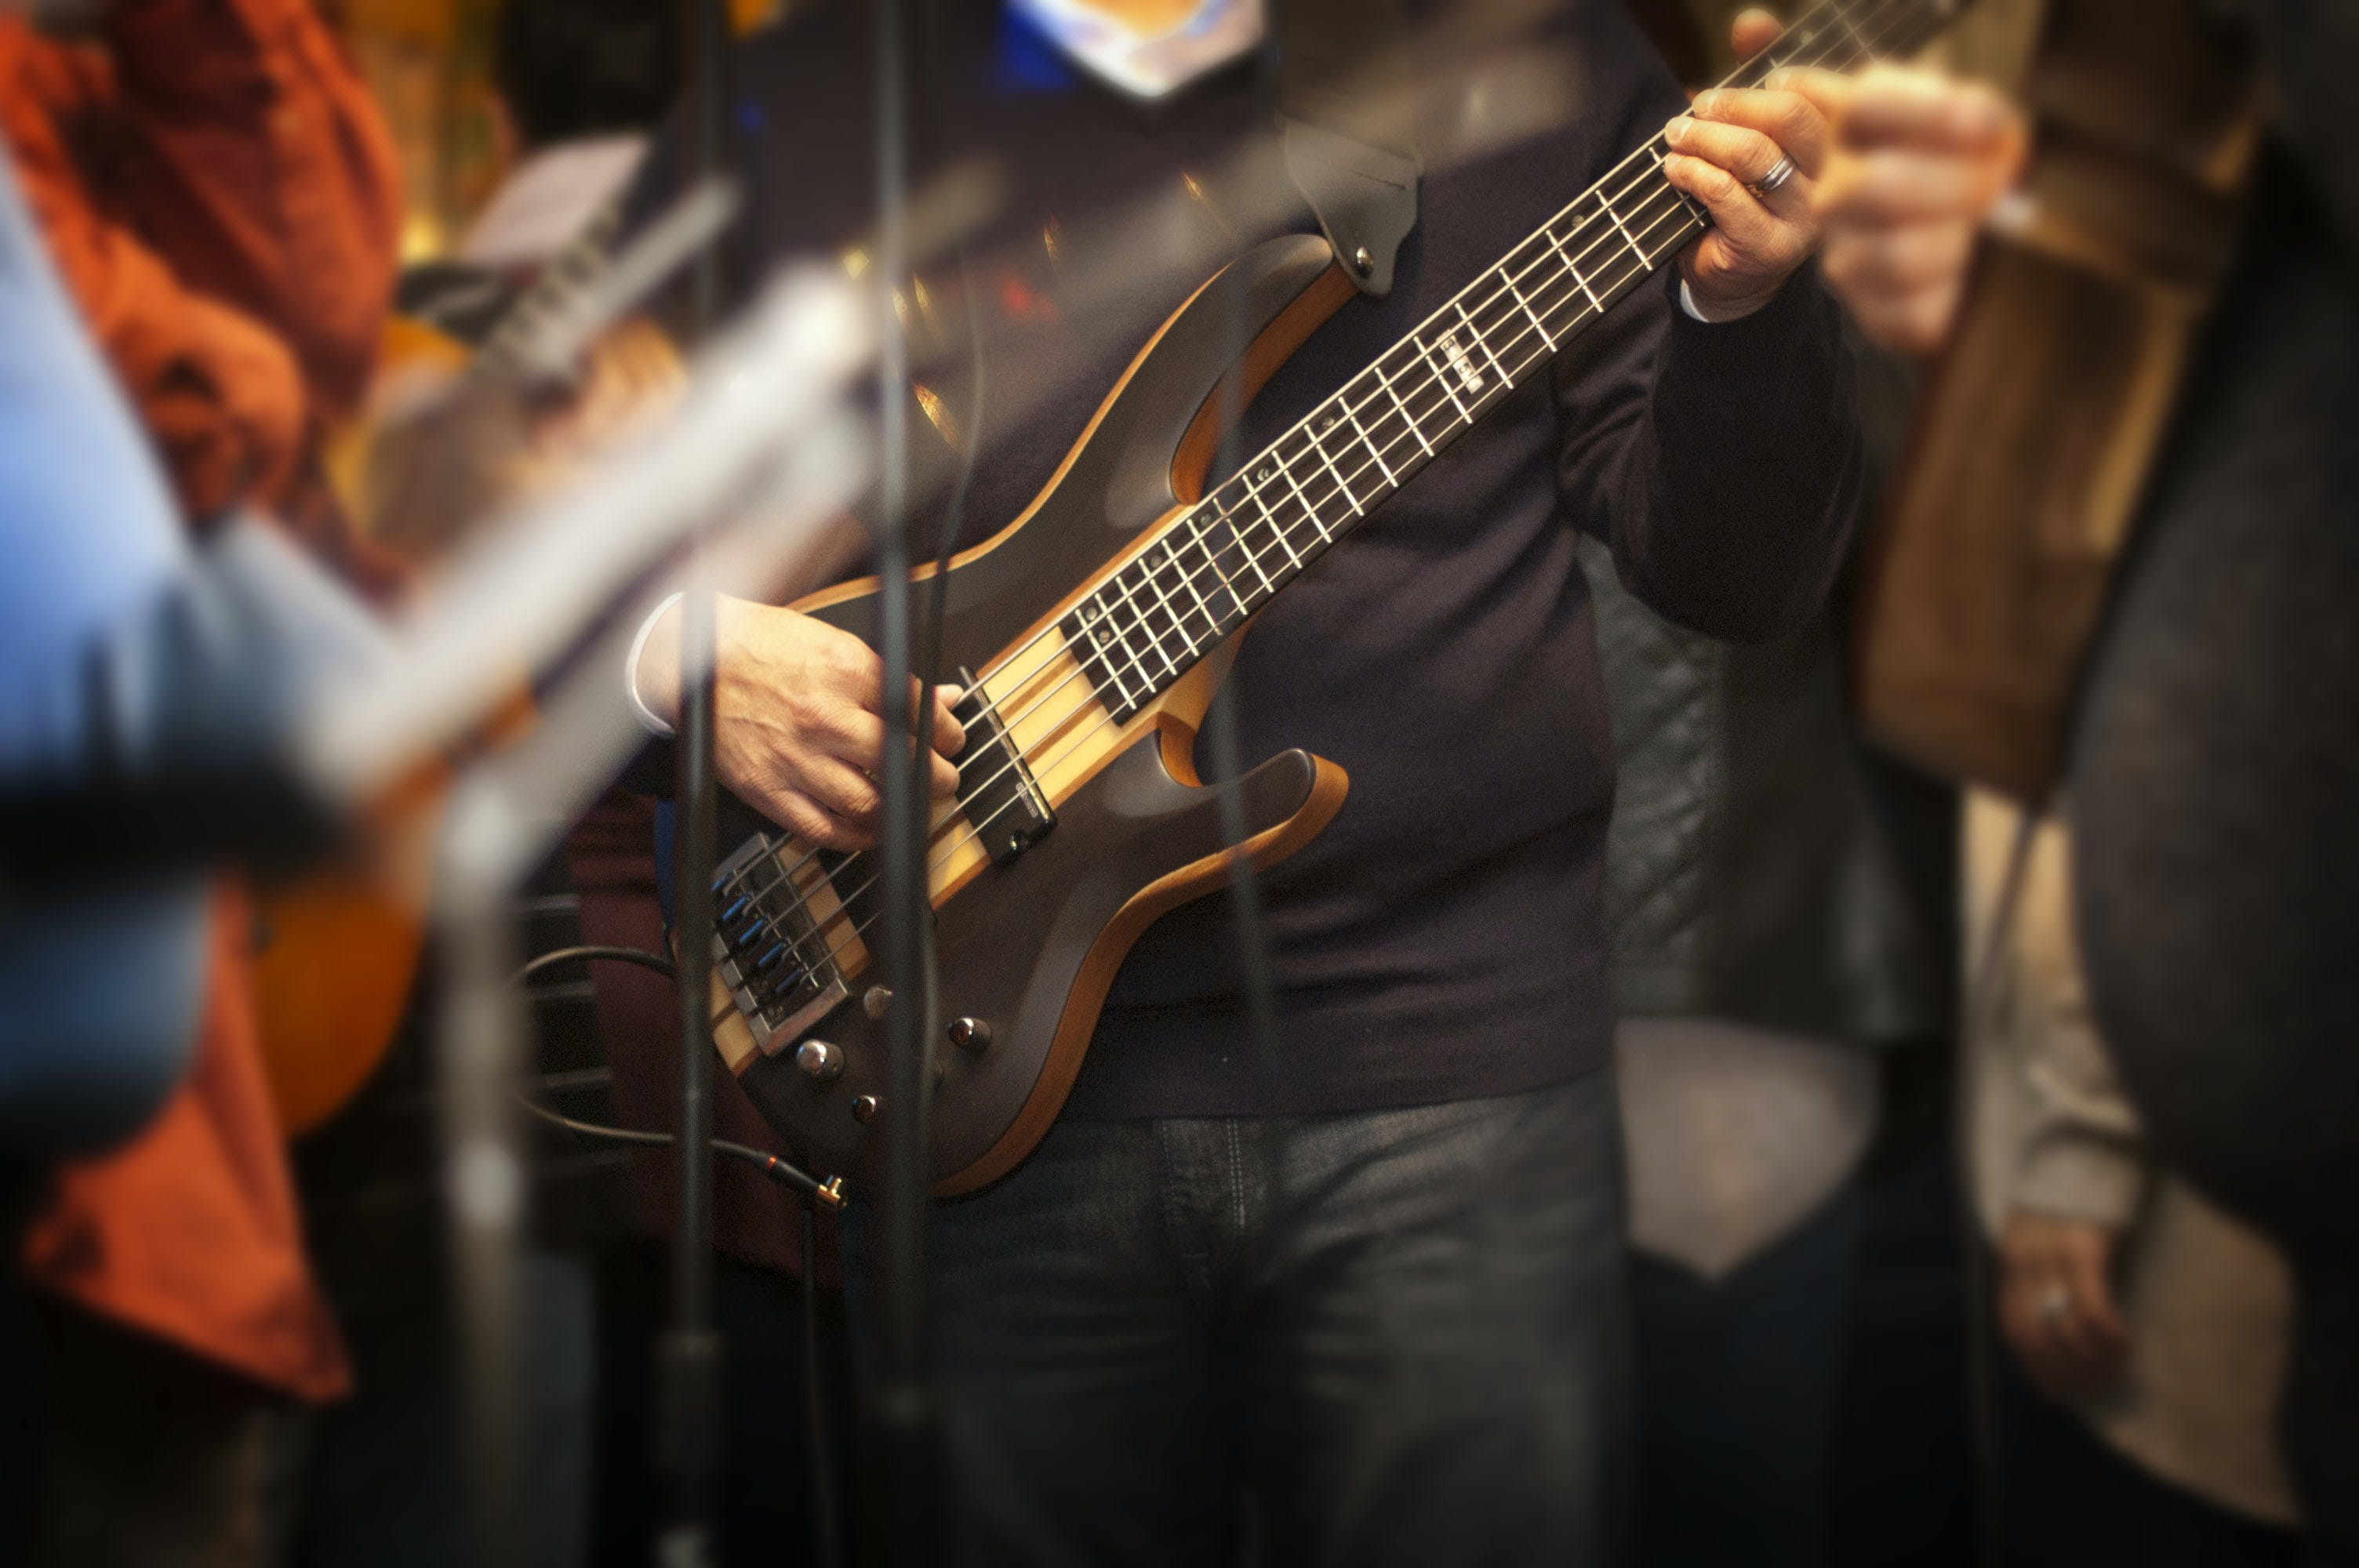 Kostenloses Stock Foto zu akkorde, aufführung, band, bass-gitarre